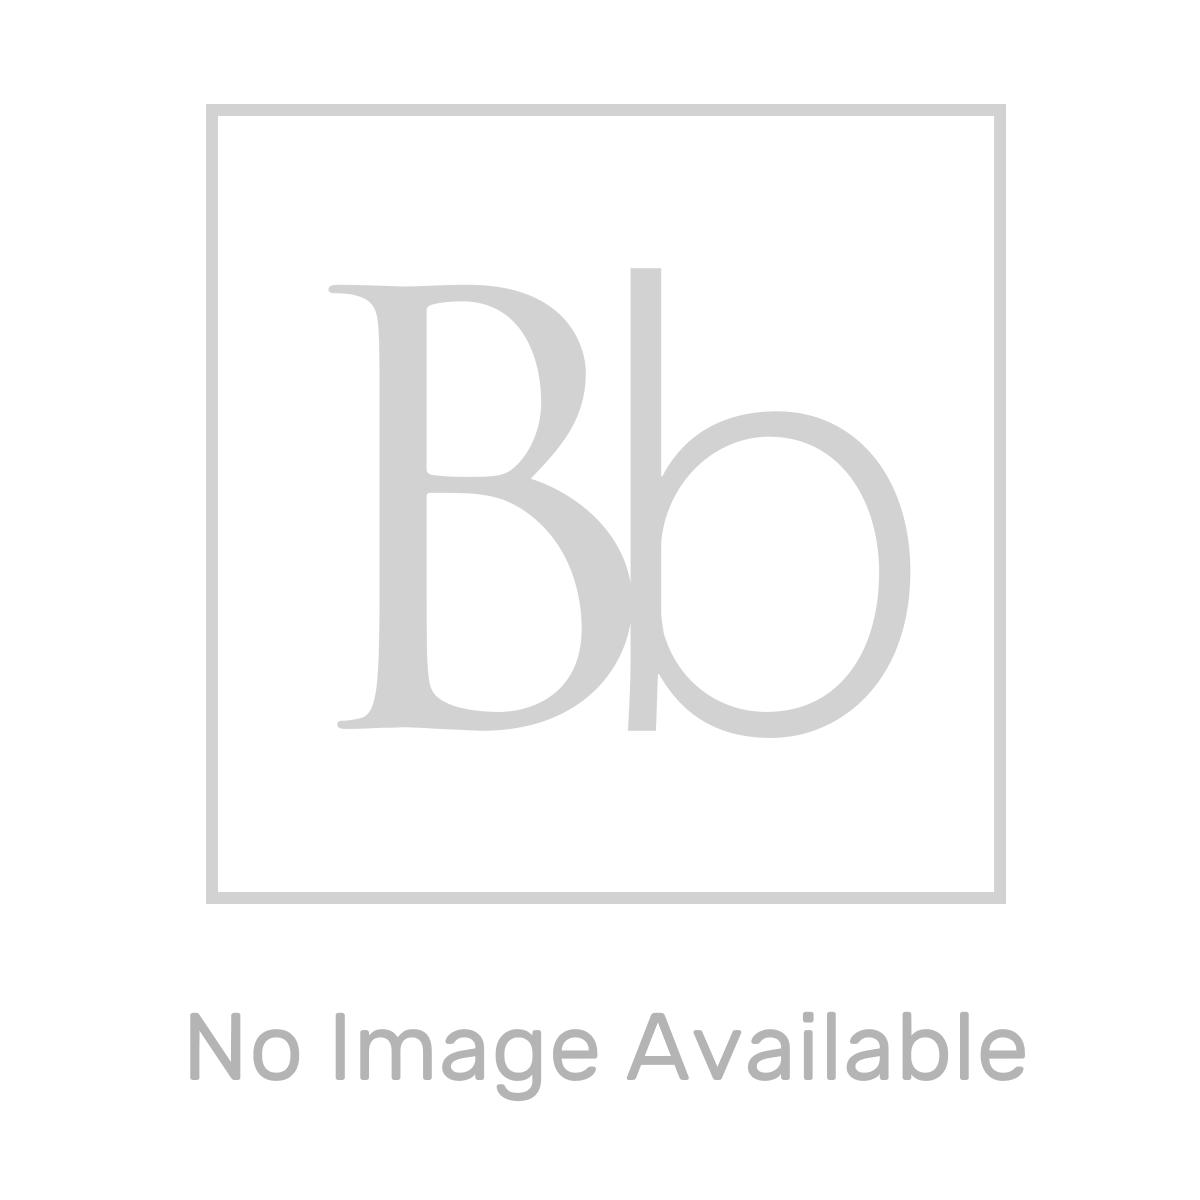 Sensio Aria Infrared sensor